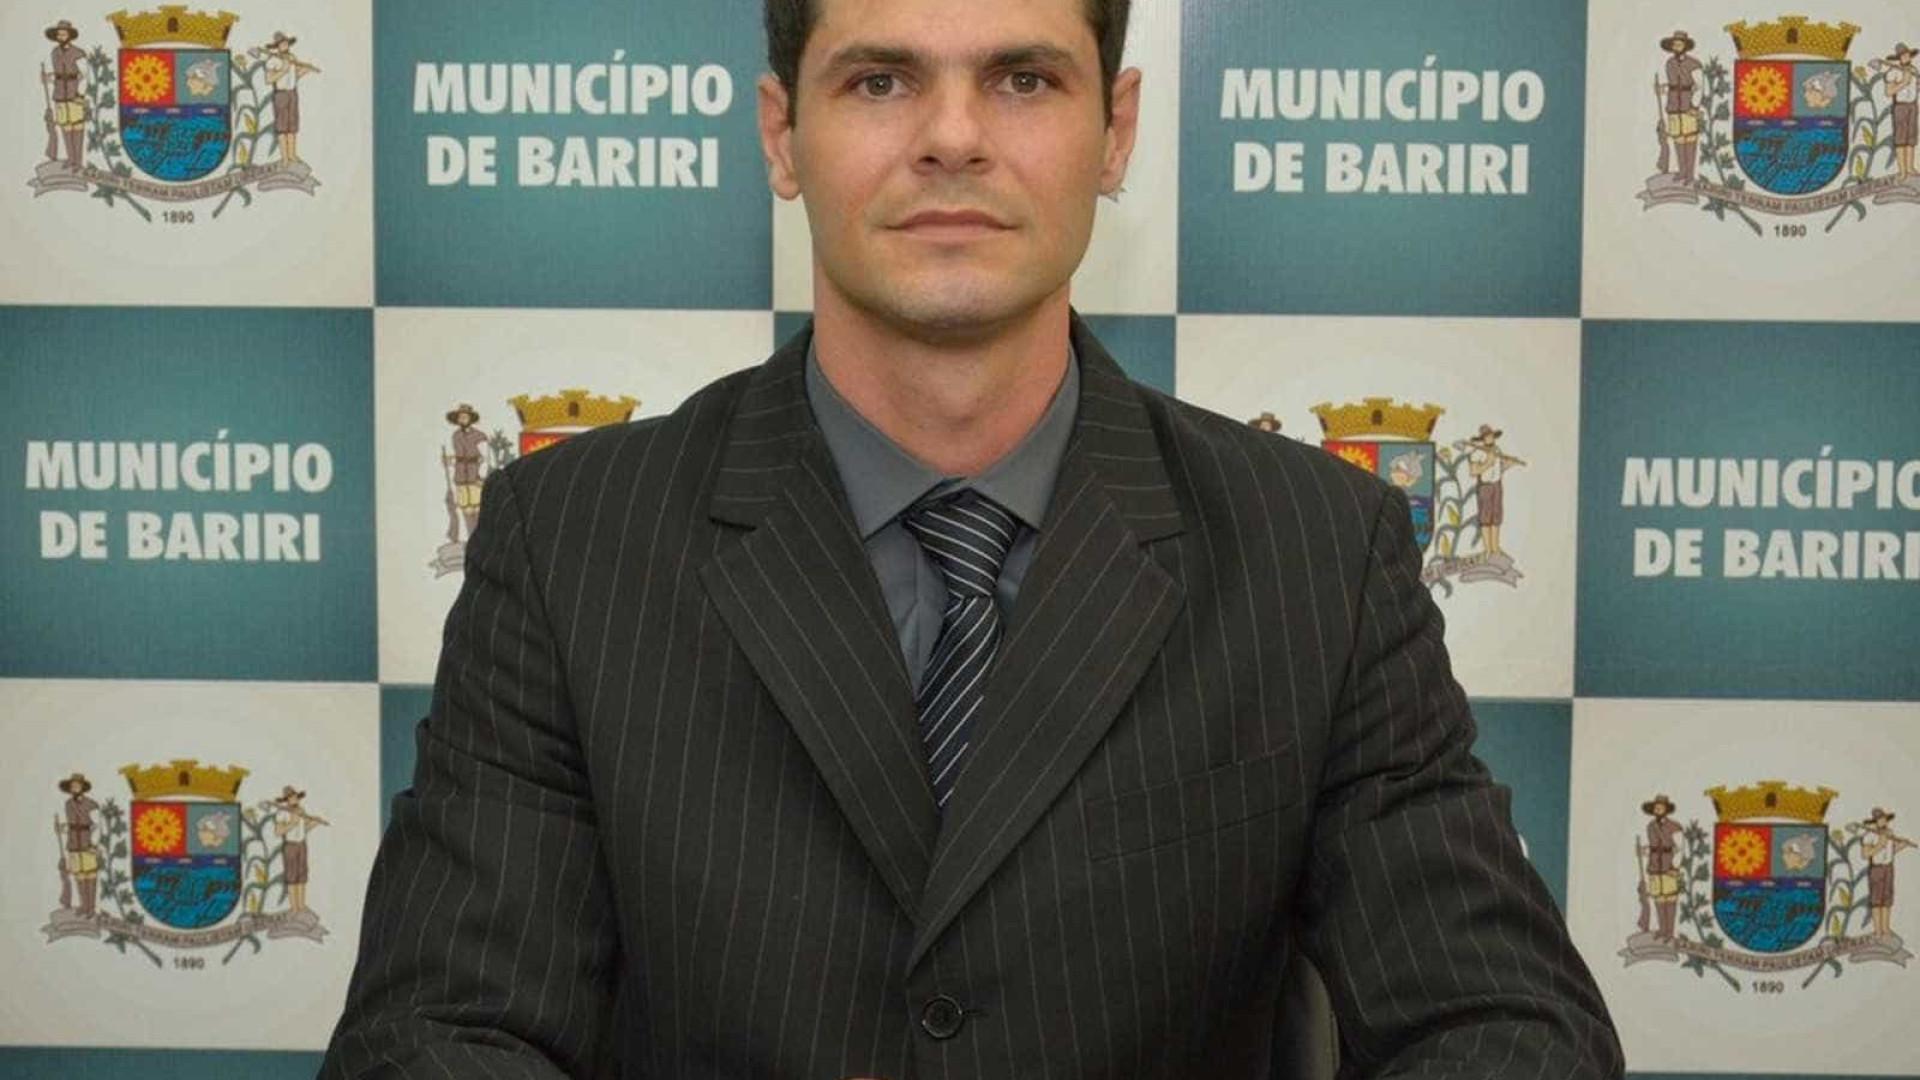 Prefeito do PSDB é preso por abusar de menina de 8 anos